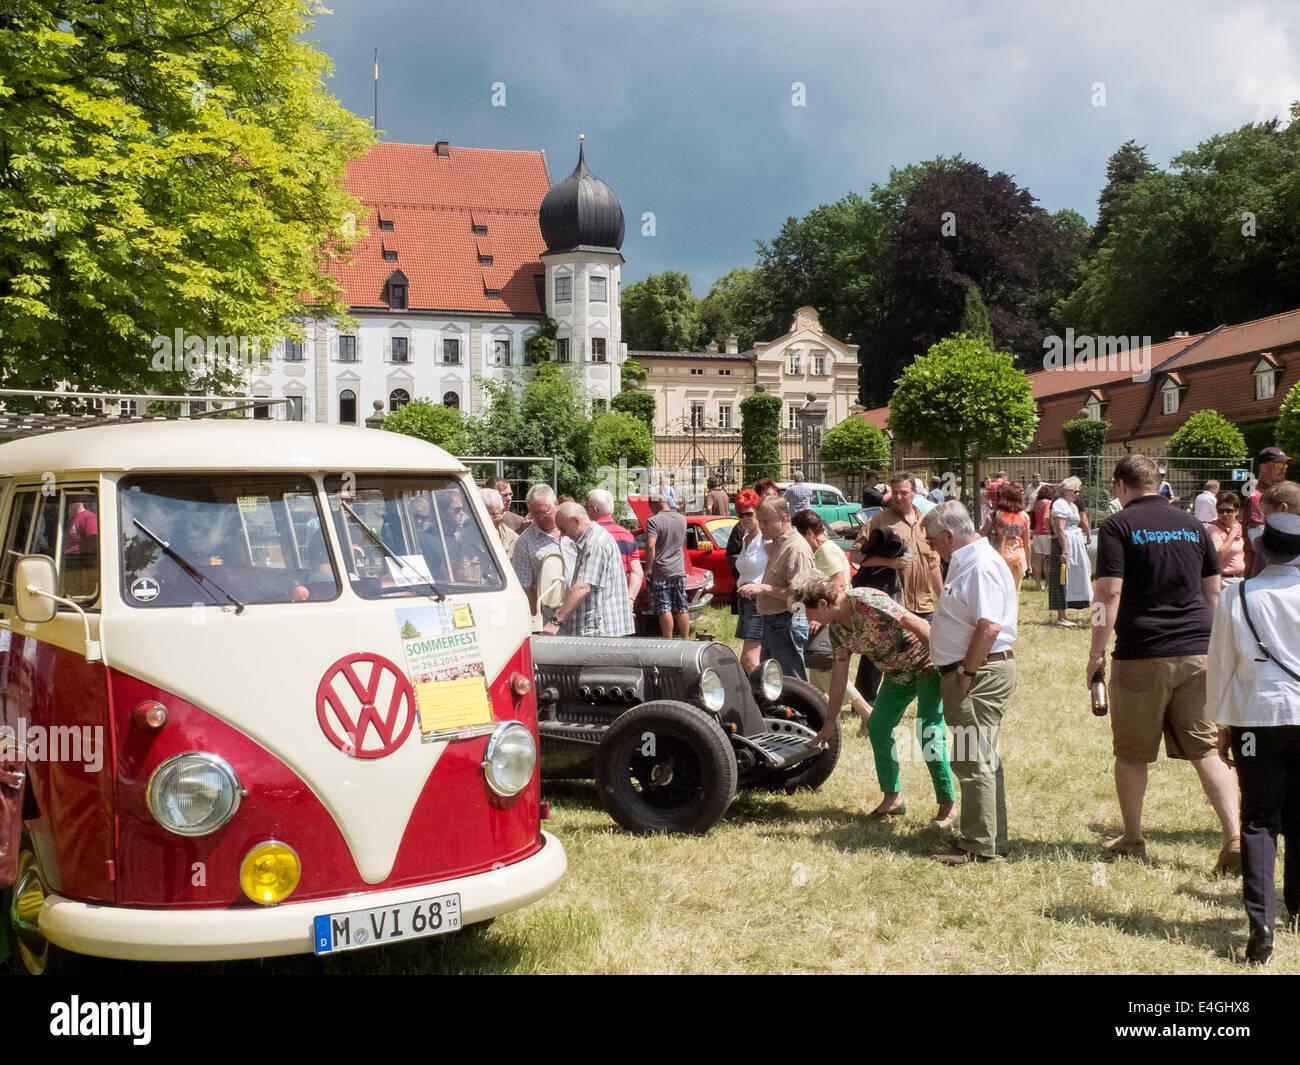 Bavarian Classic - Car Rallye at Maxlrain, Bavaria Germany 2014 Stock Photo